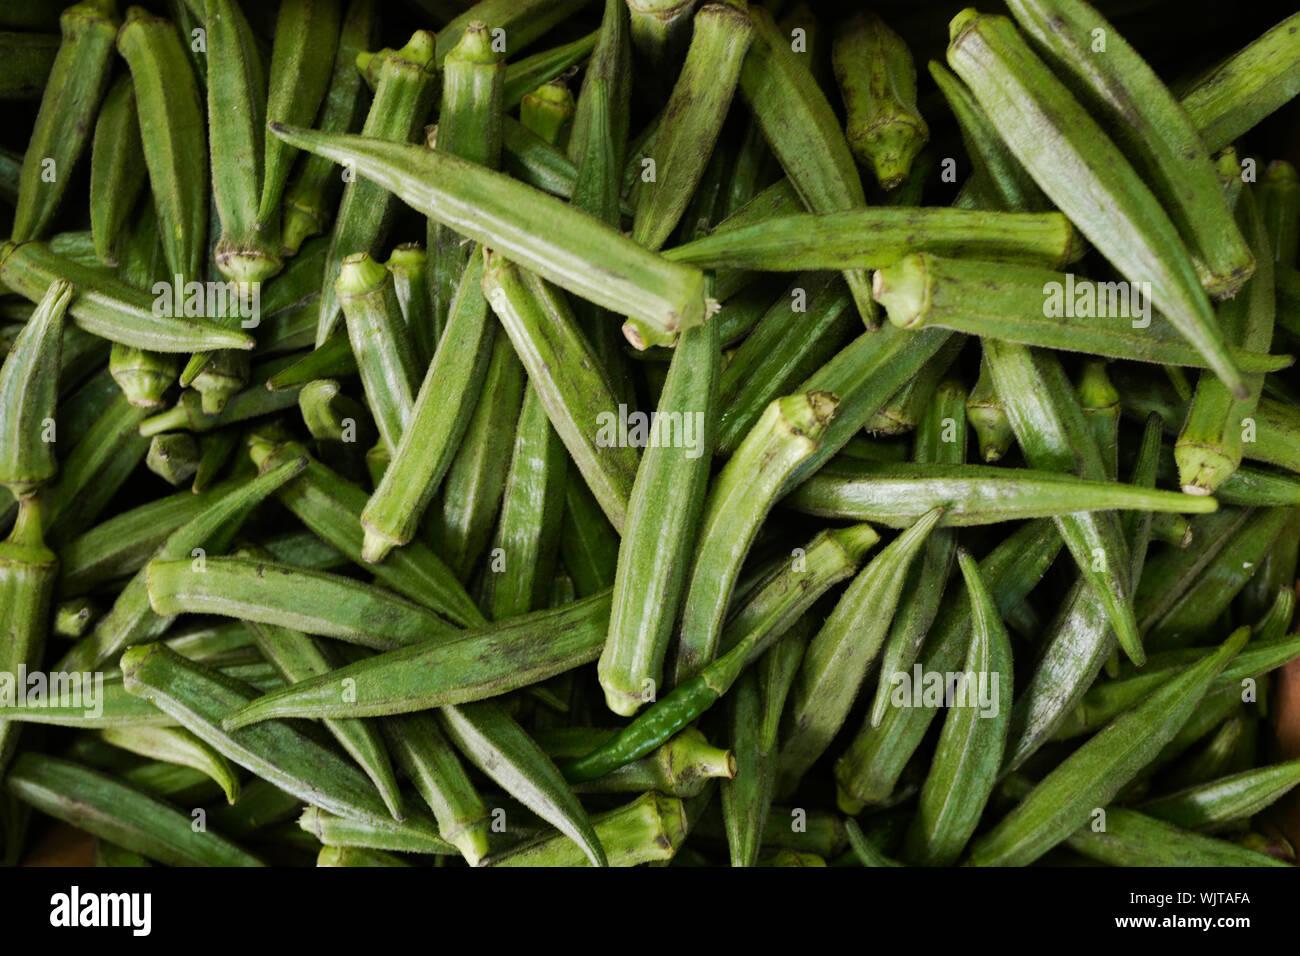 Full Frame Shot Of Okra For Sale At Market Stock Photo